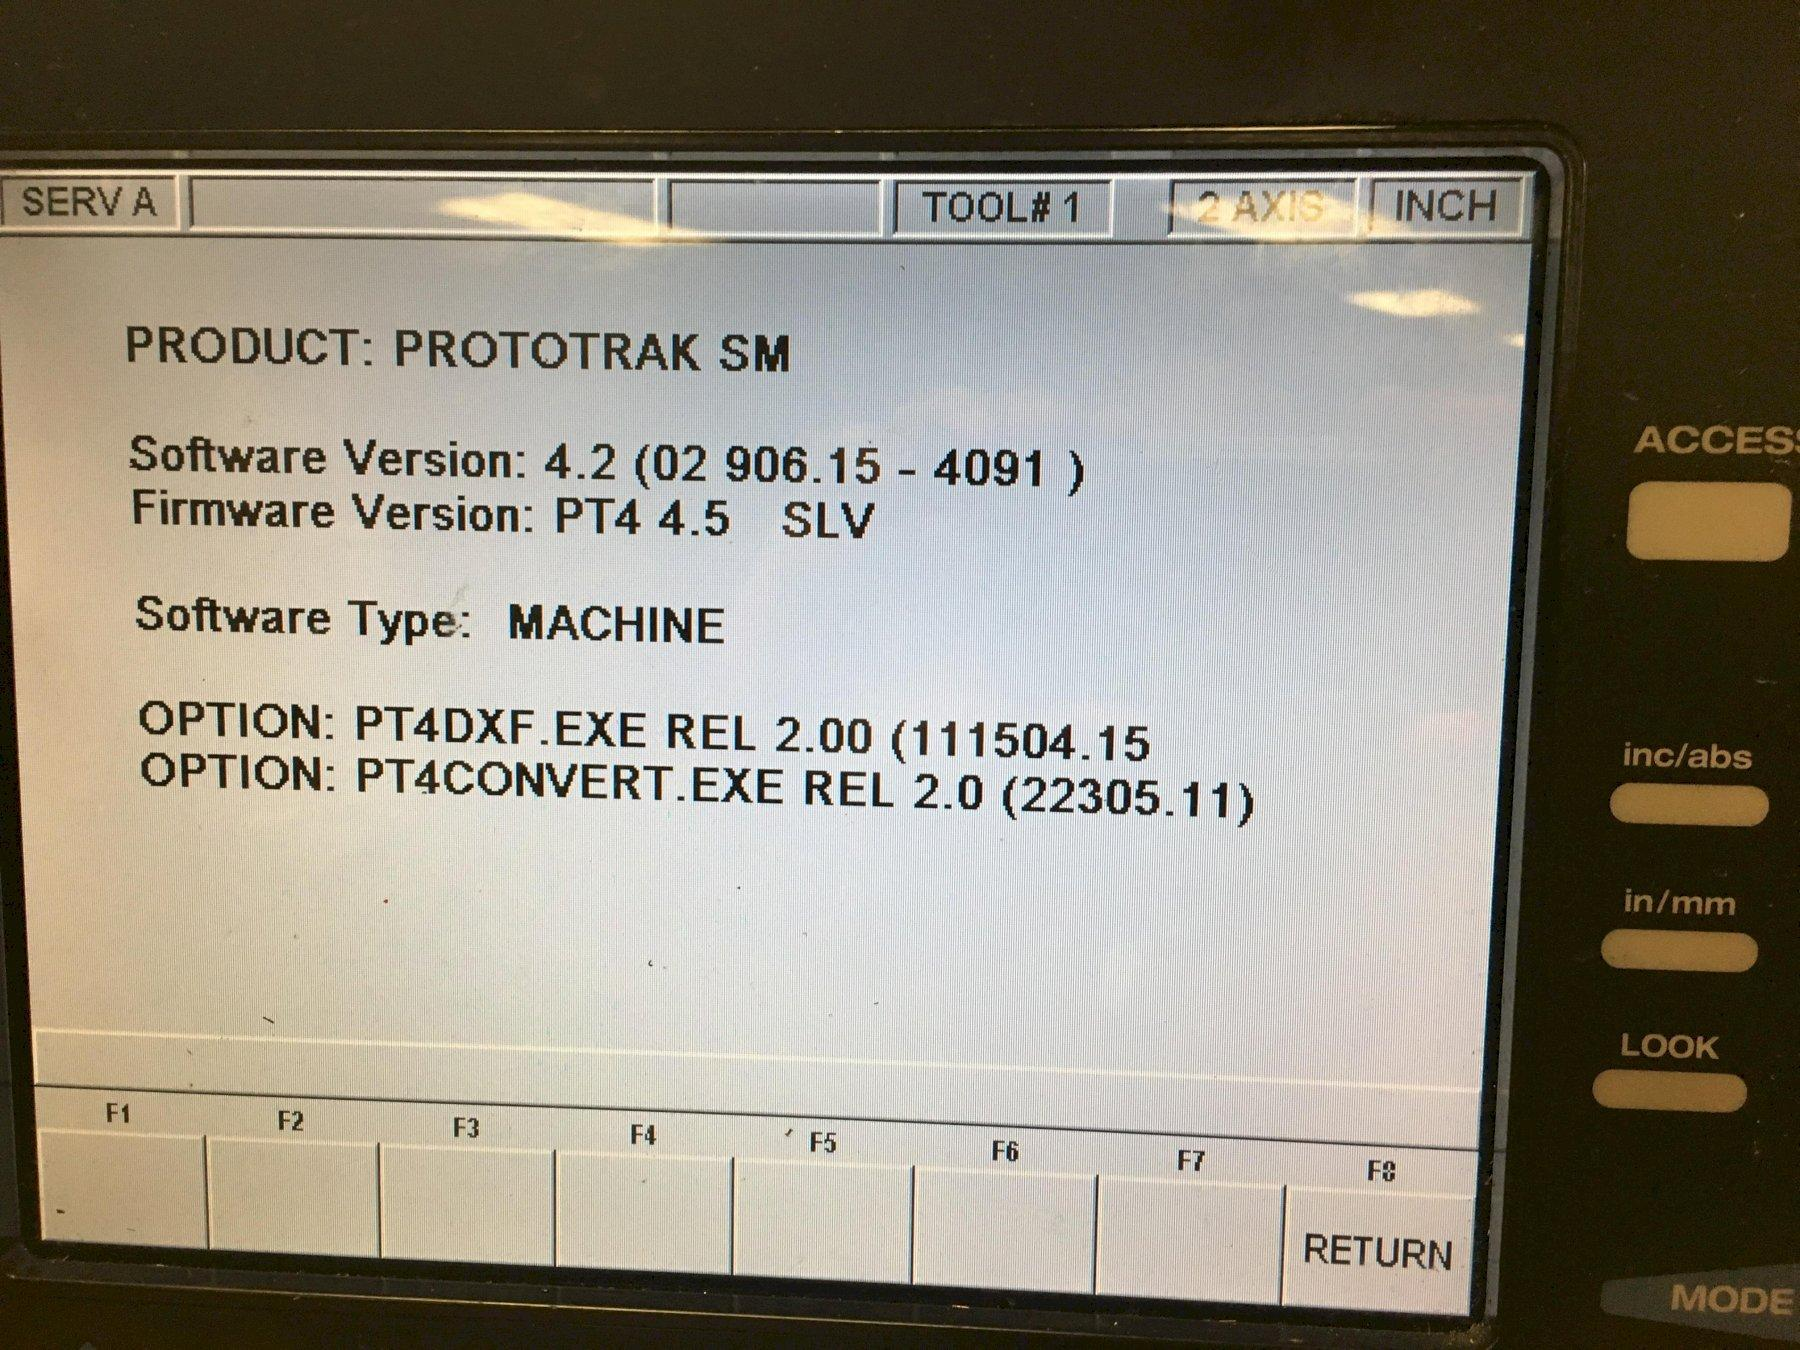 SWI TRAK Model K3 2-axis CNC Vertical Milling Machine, Prototrak SM Control